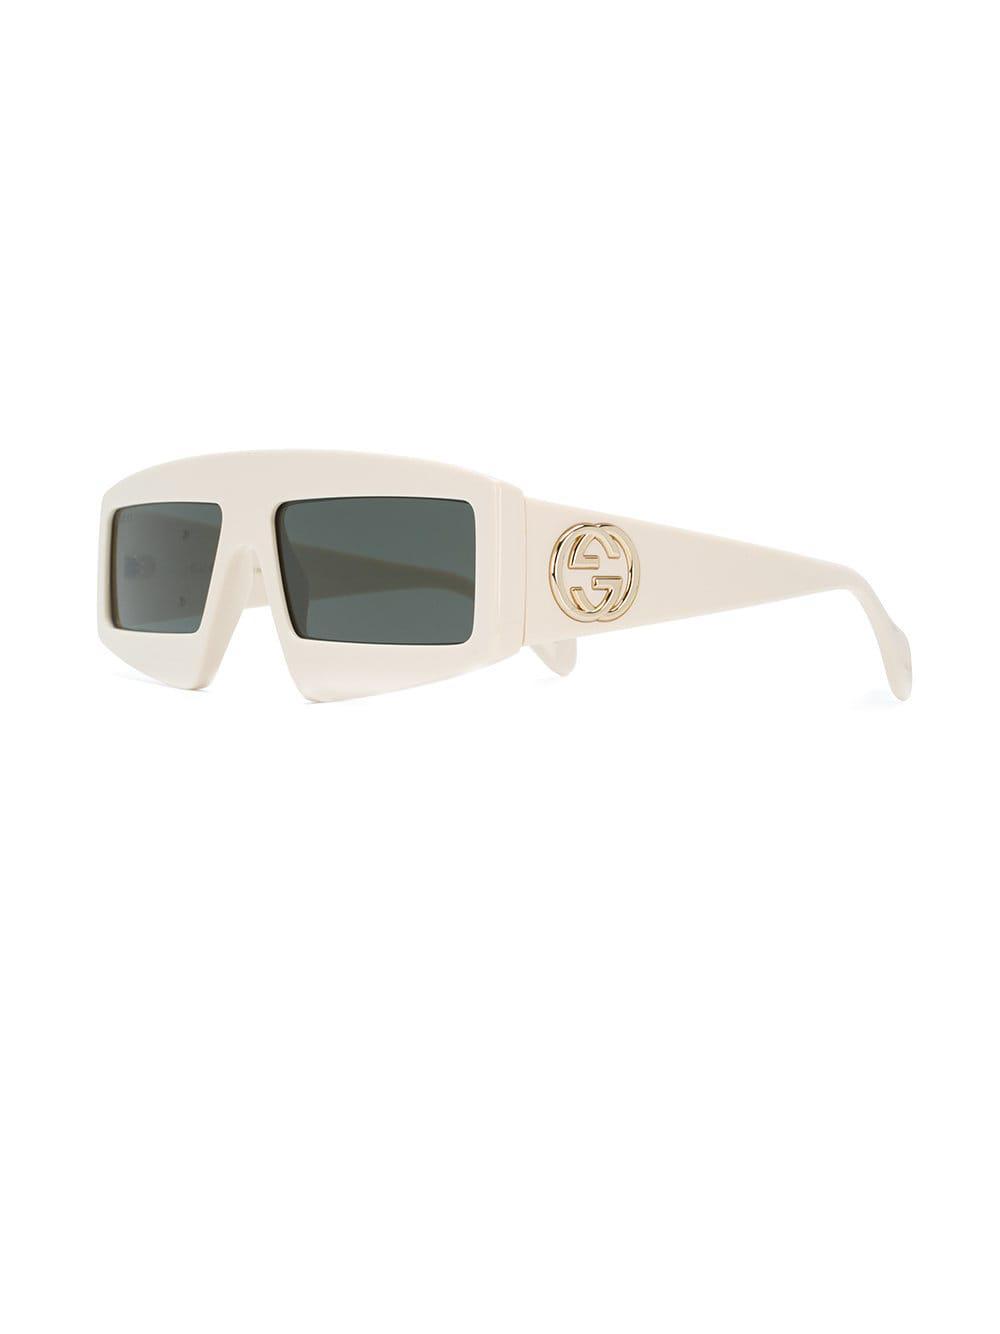 111086f228 Gucci GG Square Frame Sunglasses - Save 2% - Lyst